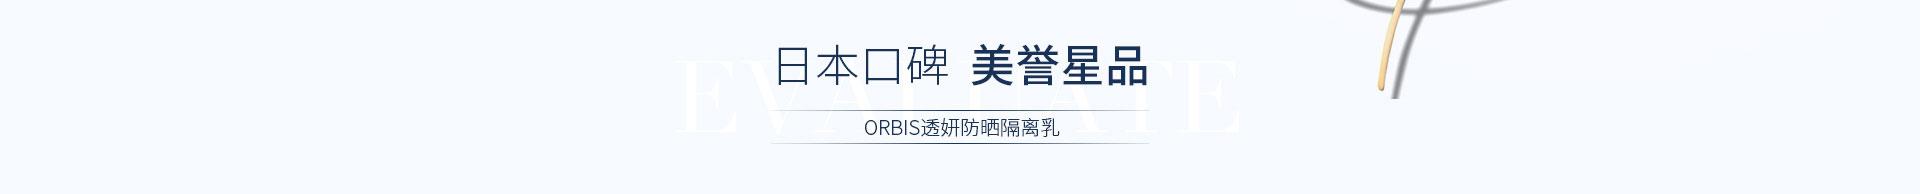 orbis奥蜜思透妍防晒隔离乳194